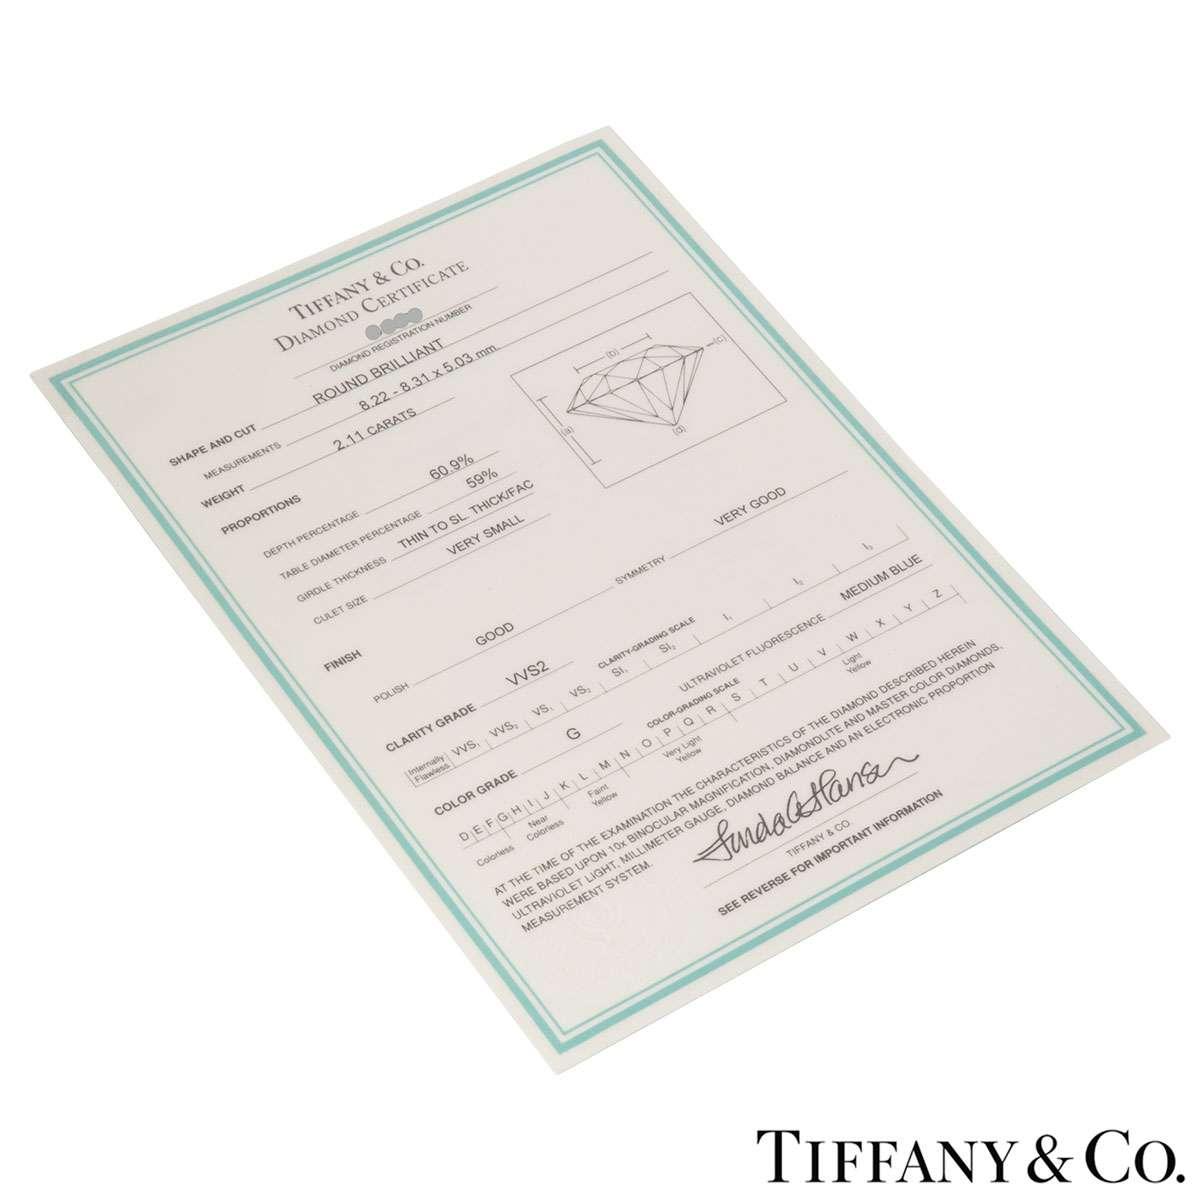 Tiffany & Co. Platinum Diamond Setting Band Ring 2.11ct G/VVS2